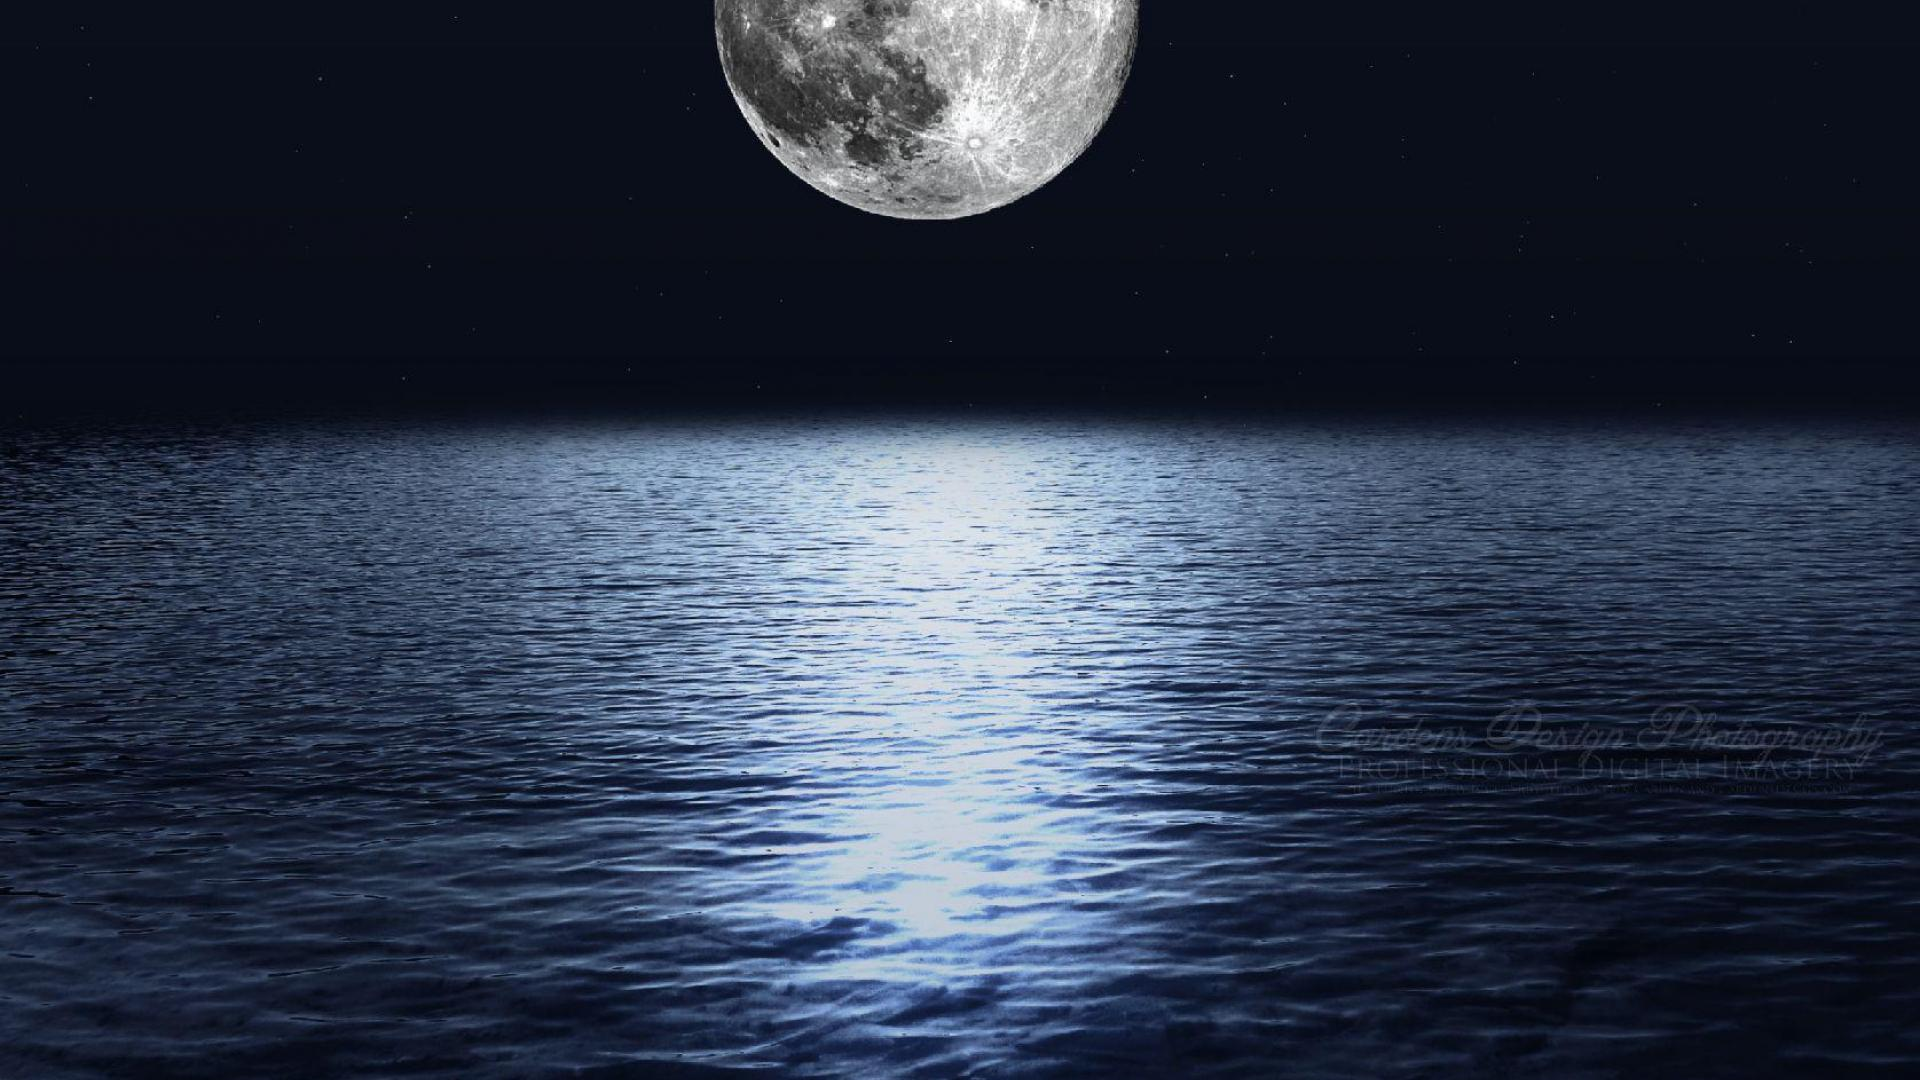 Moon Over Ocean Wallpaper - WallpaperSafari